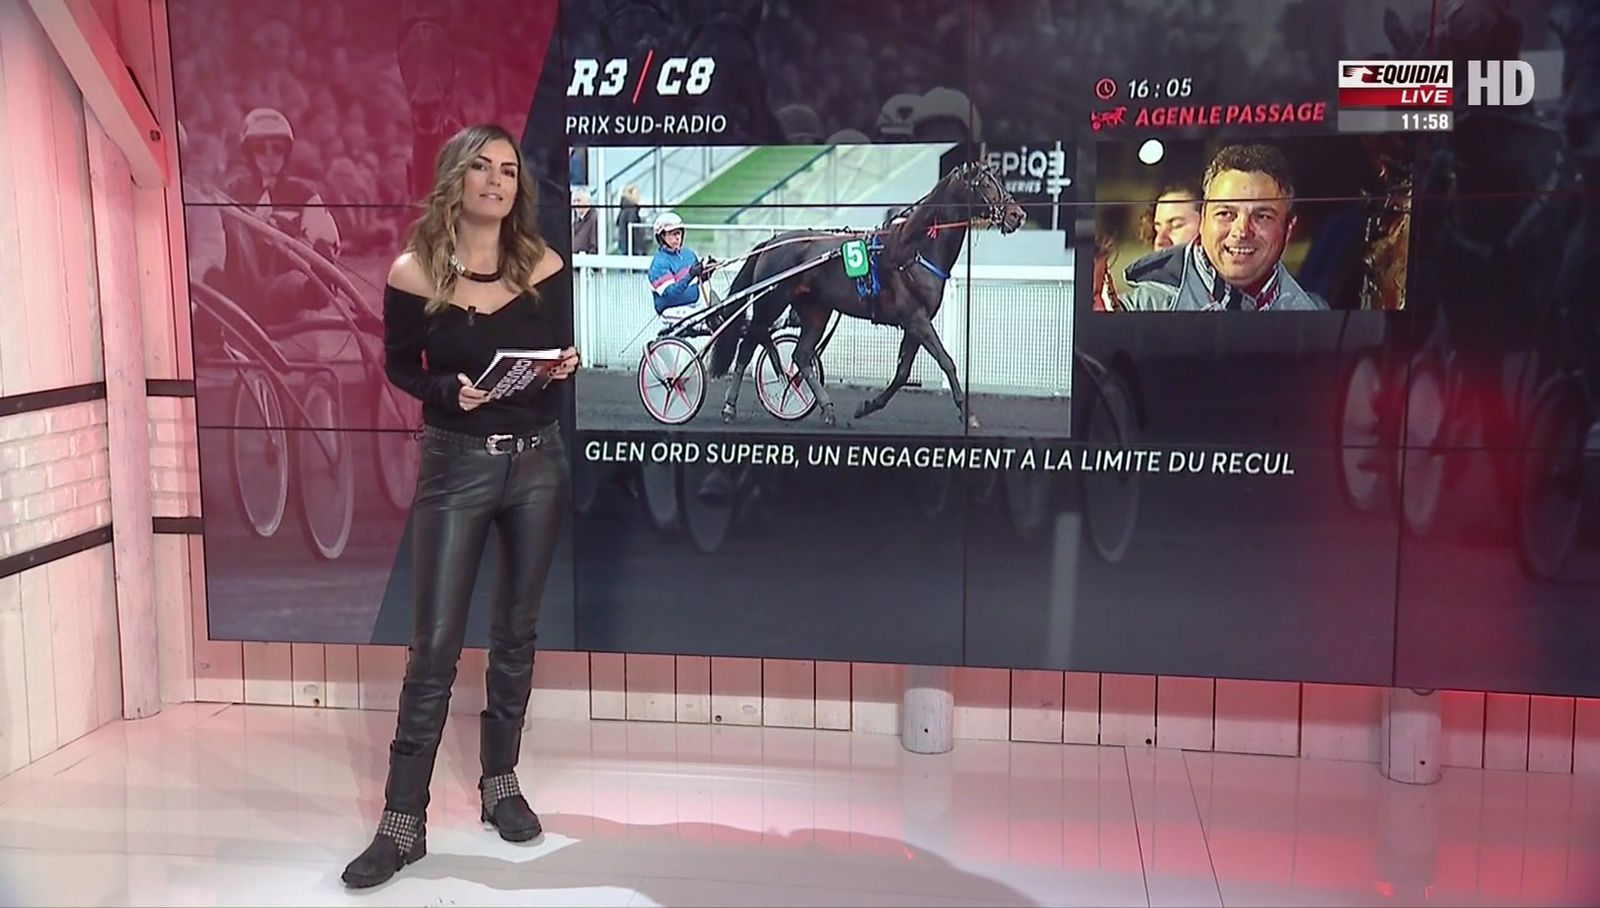 �7 AMELIE BITOUN ❤️❤️❤️❤️❤️ @ameliebitoun ❤️❤️❤️❤️❤️ ce matin @Equidia_Live � #unjourauxcourses #vuesalatele